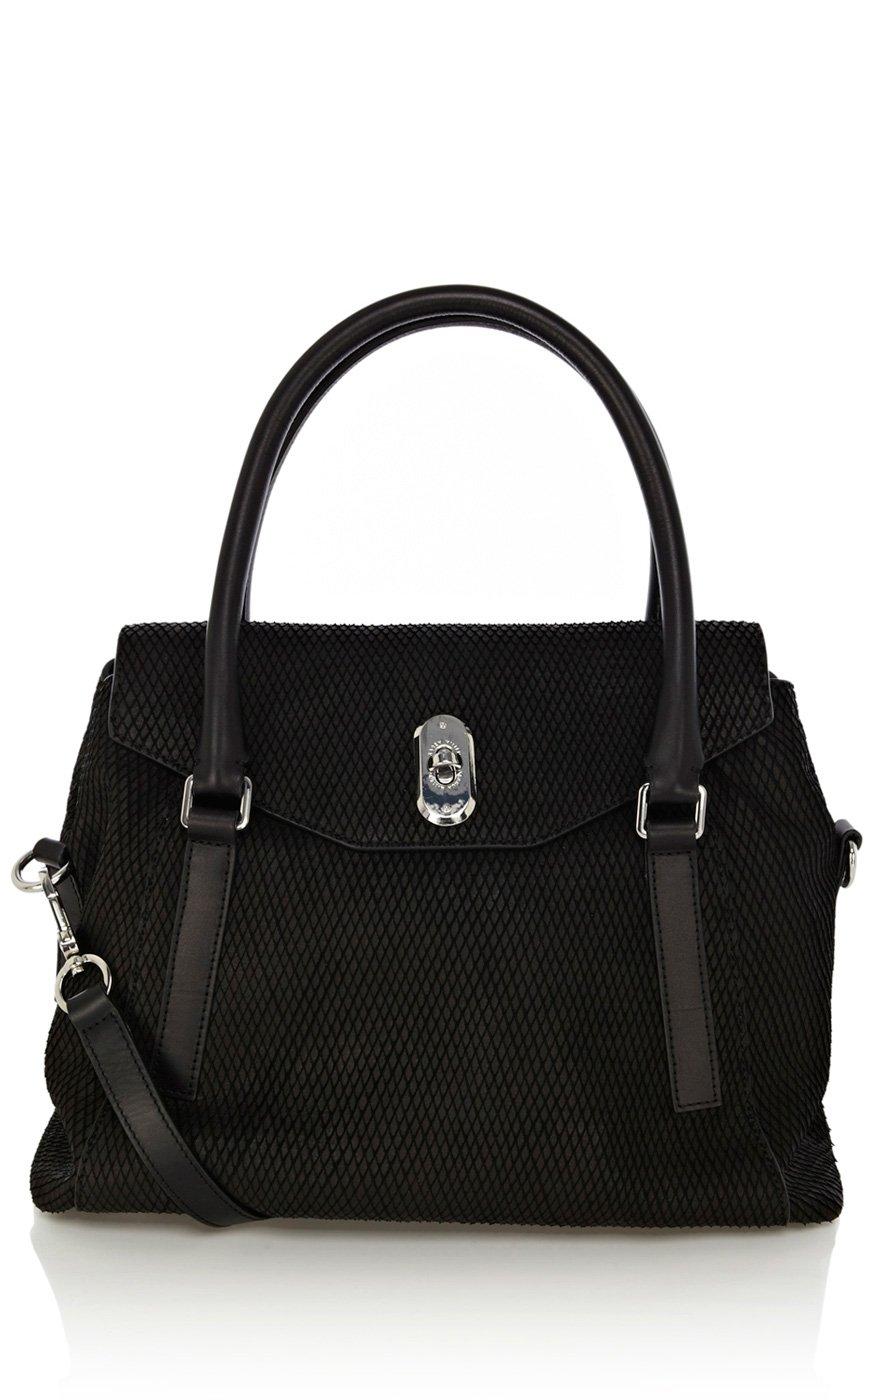 Karen Millen Textured Snake Leather Box Bag In Black